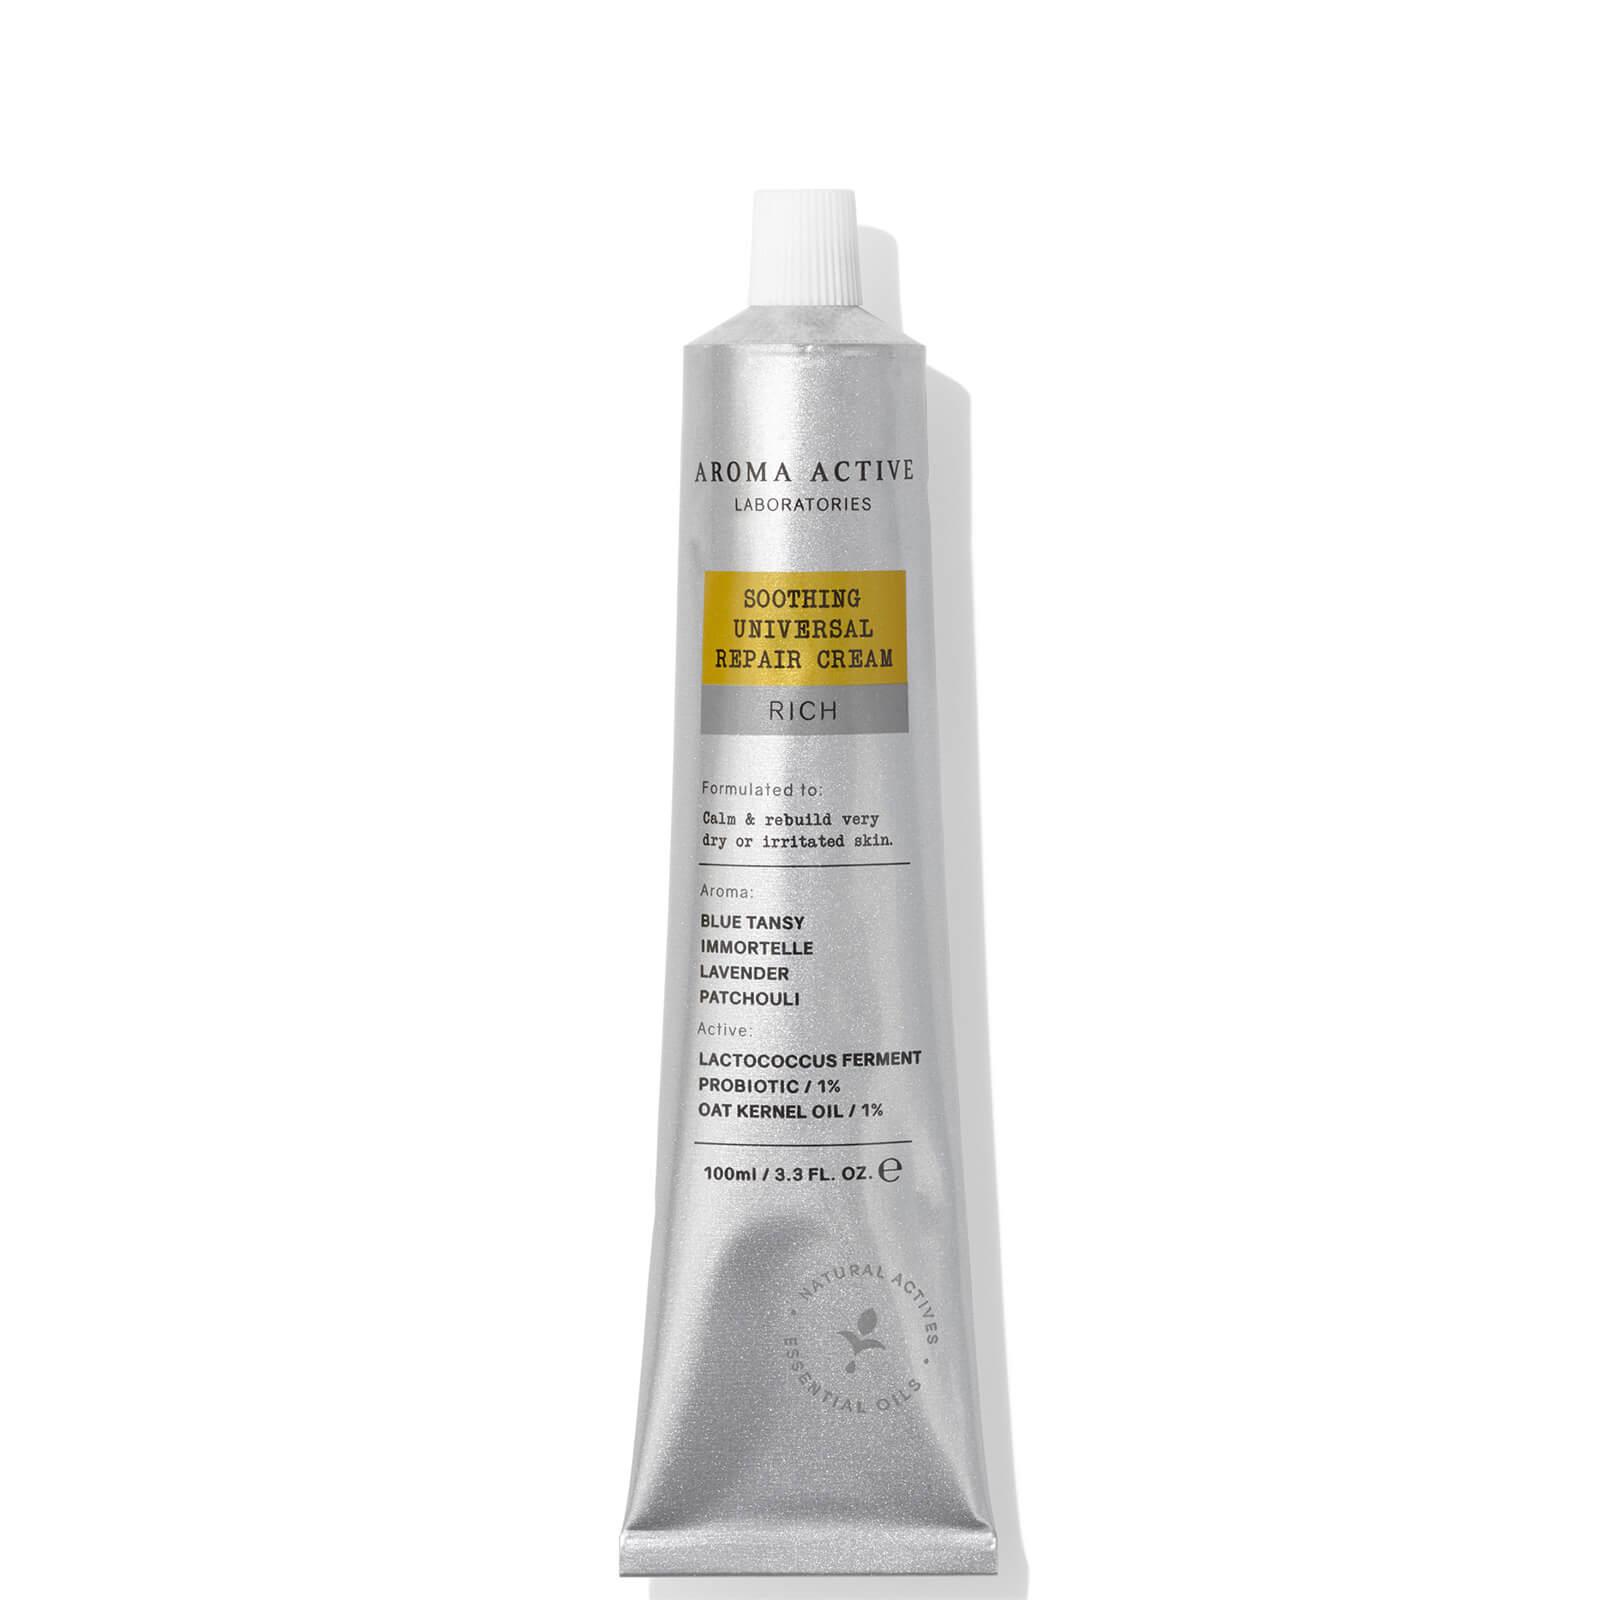 Купить Aroma Active Soothing Universal Repair Cream Rich 100ml